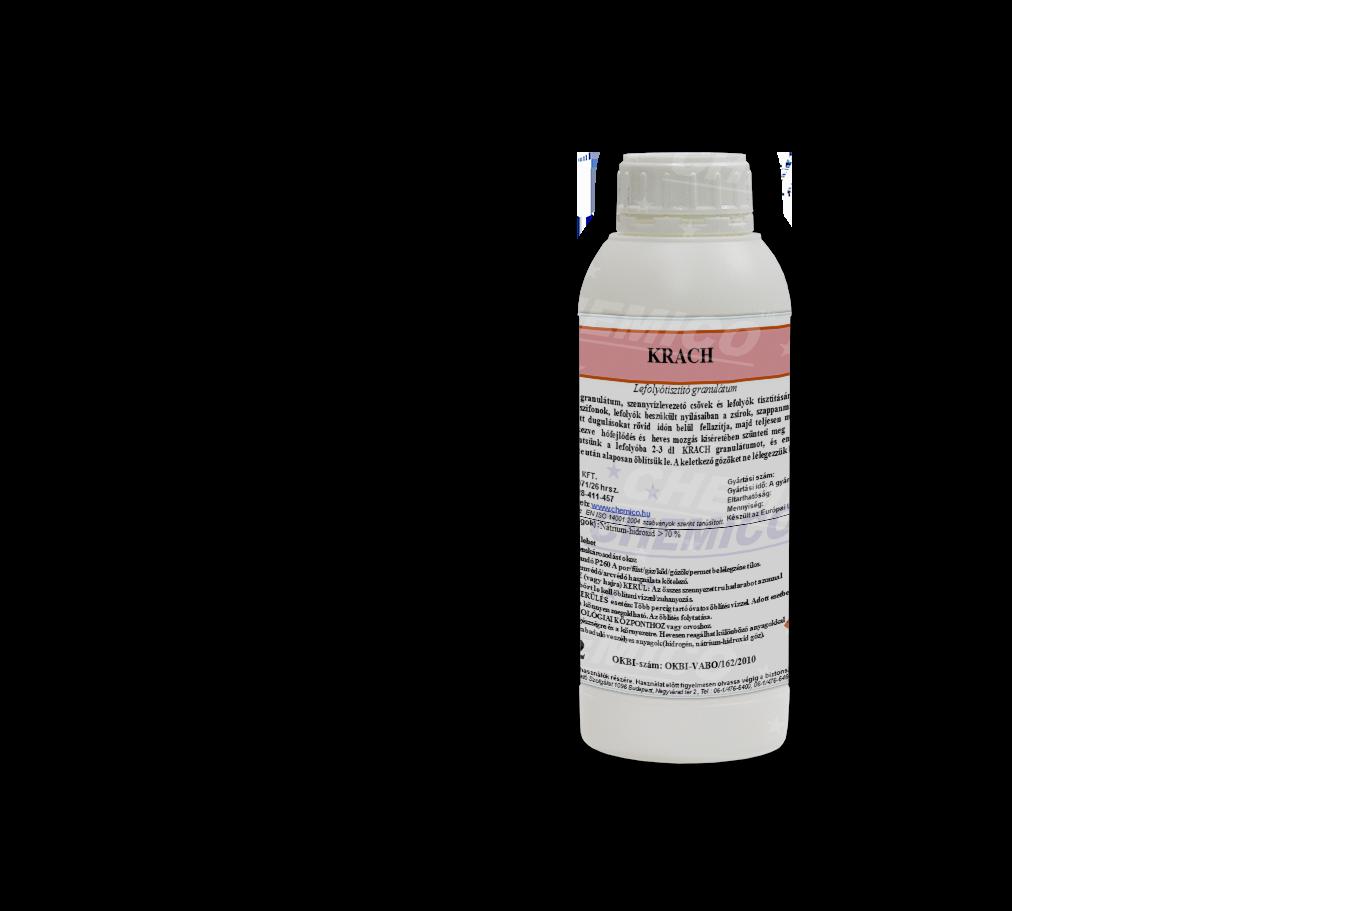 krach-lefolyotisztito-szifon-granulatum-dugulas-elharit-chemico-ipari-1kg